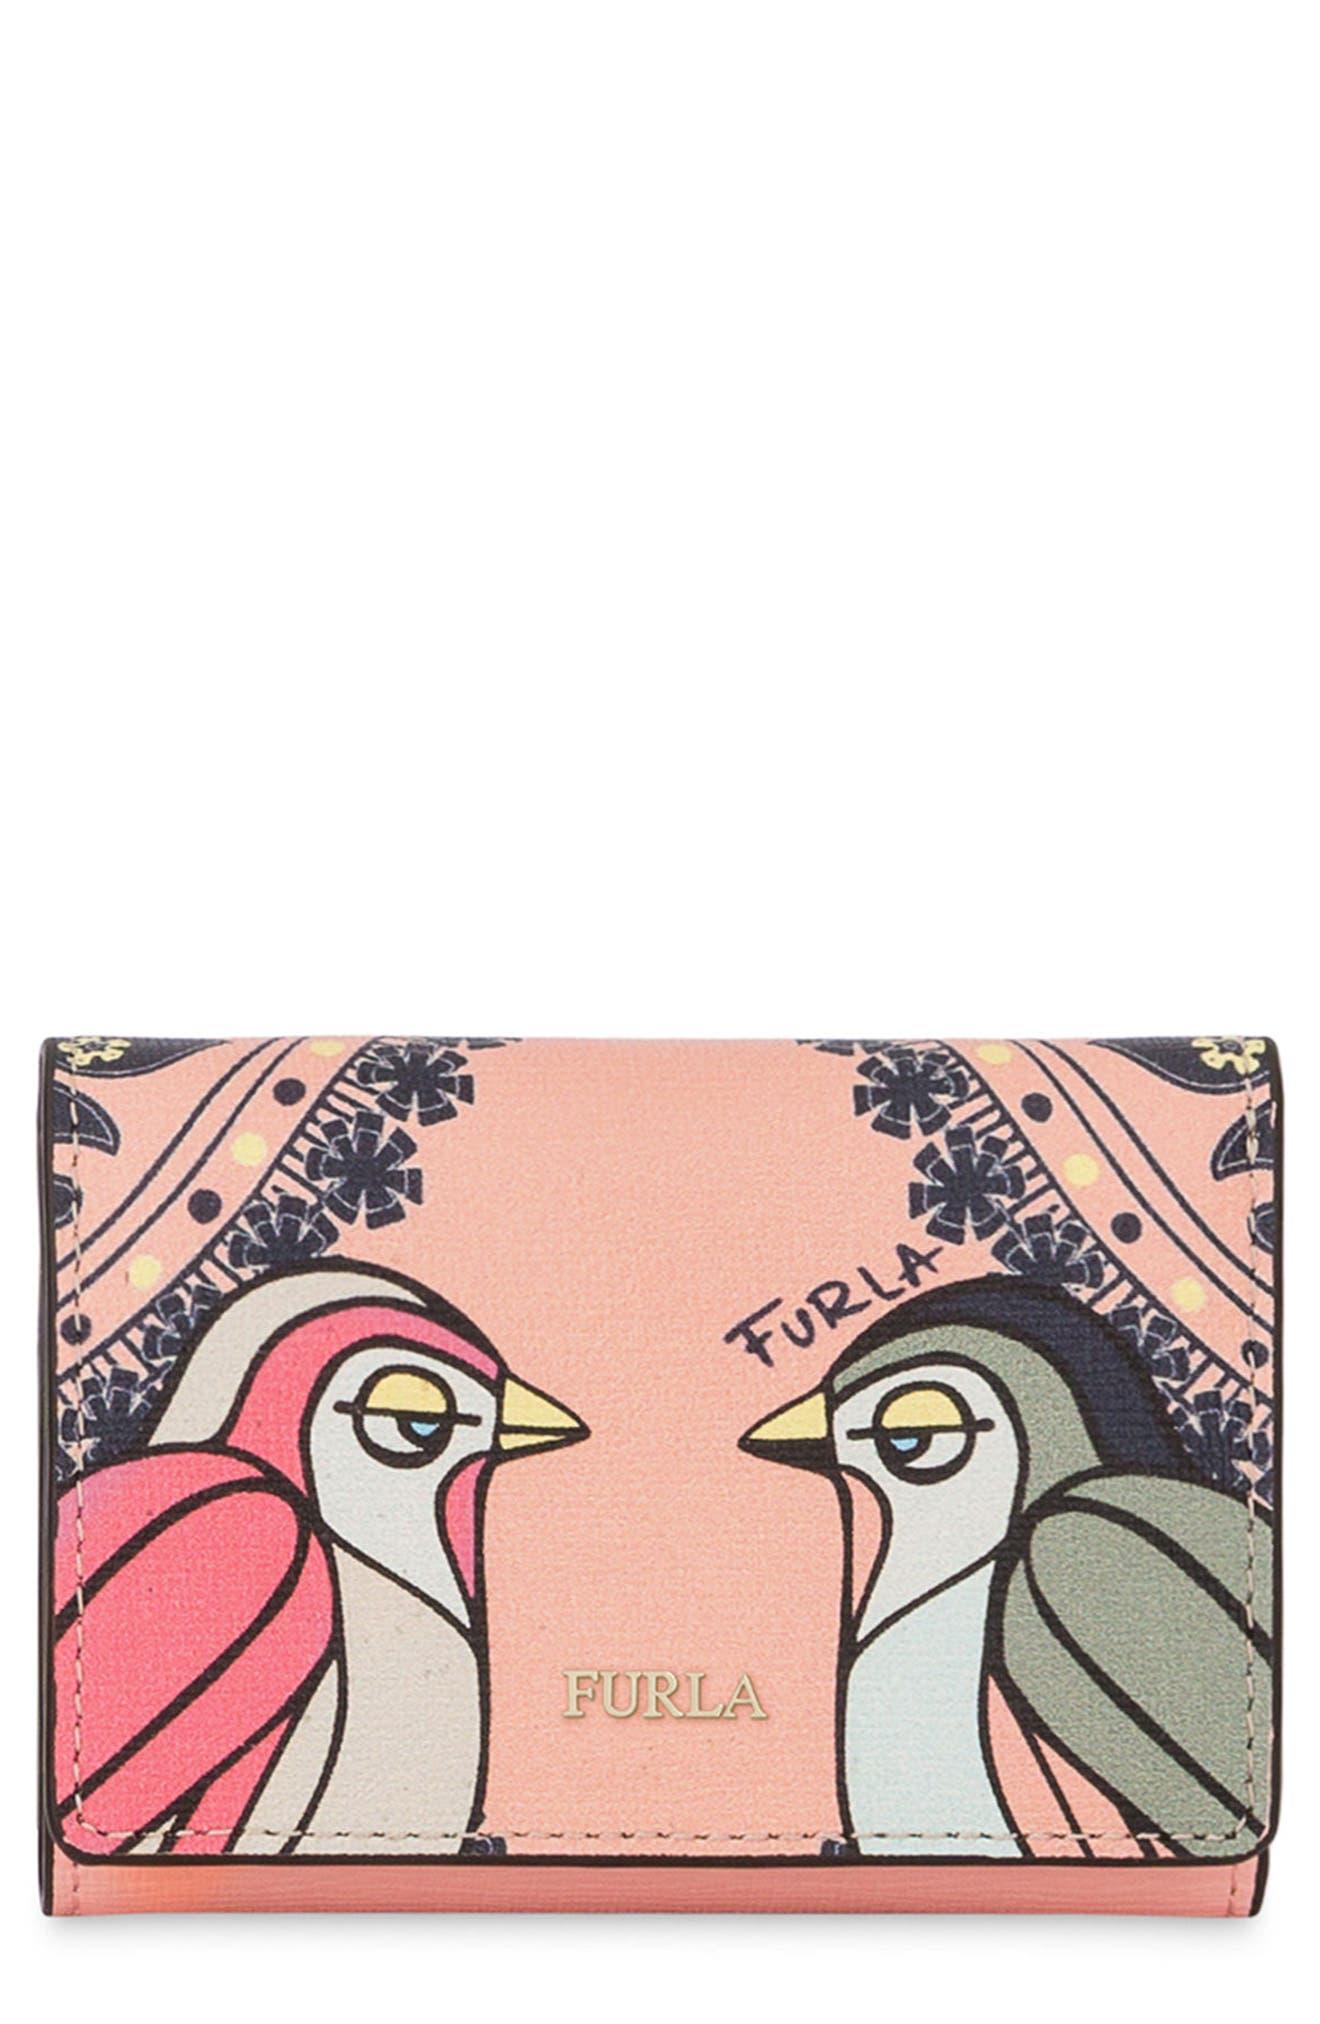 Alternate Image 1 Selected - Furla Babylon Saffiano Leather Trifold Wallet